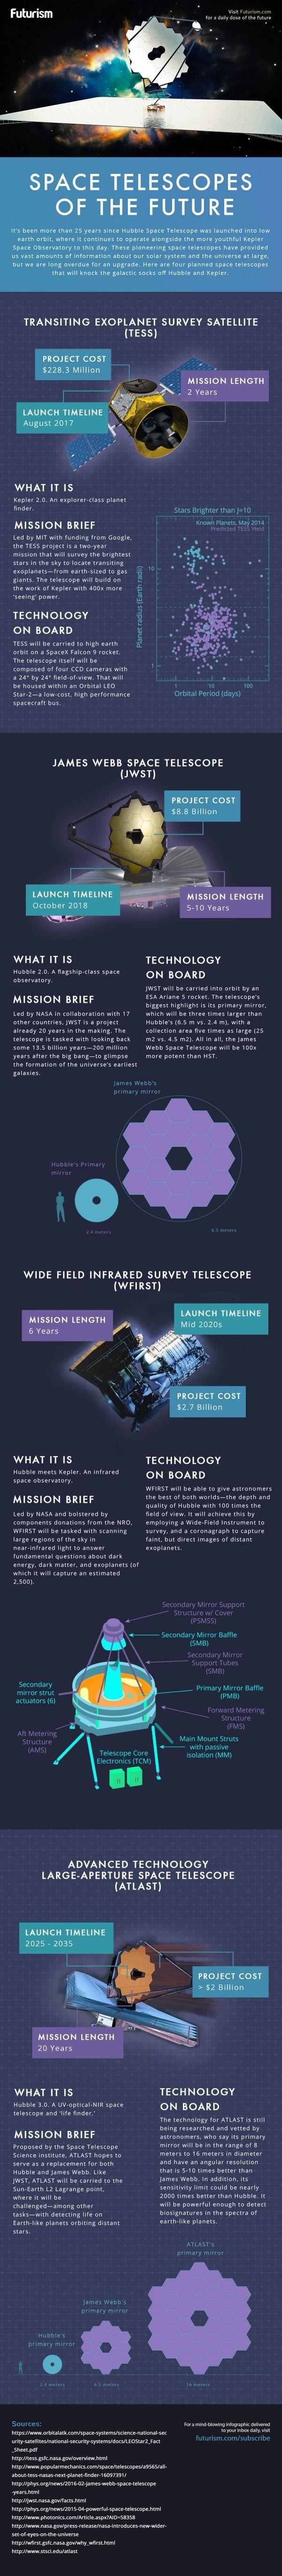 james webb space telescope infographic